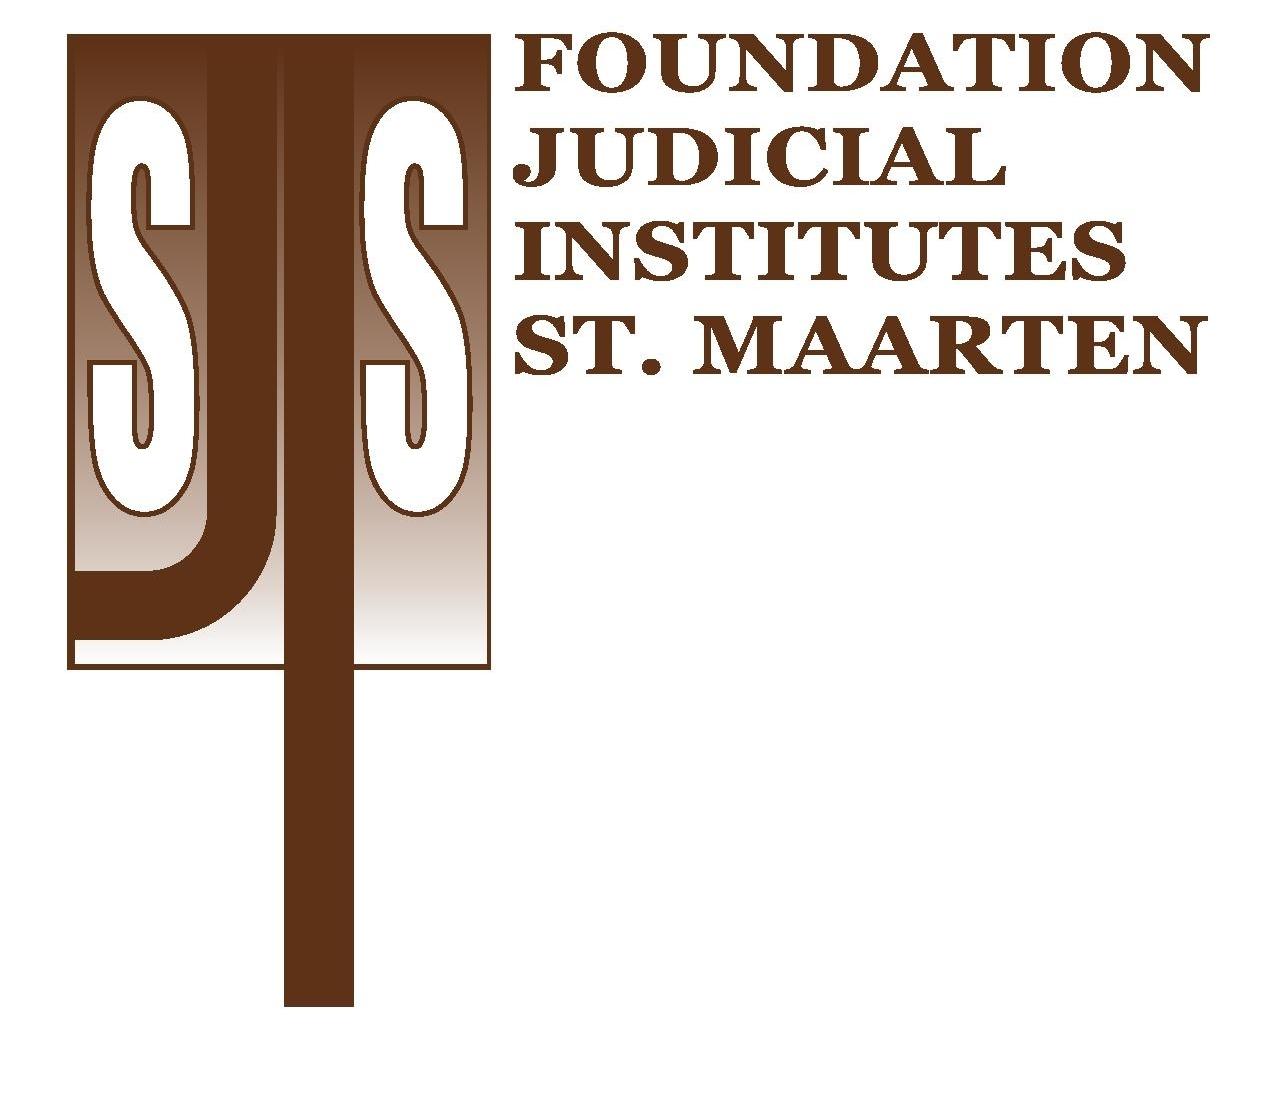 Stichting Justitiele Instellingen St. Maarten/Foundation Institutes St. Maarten